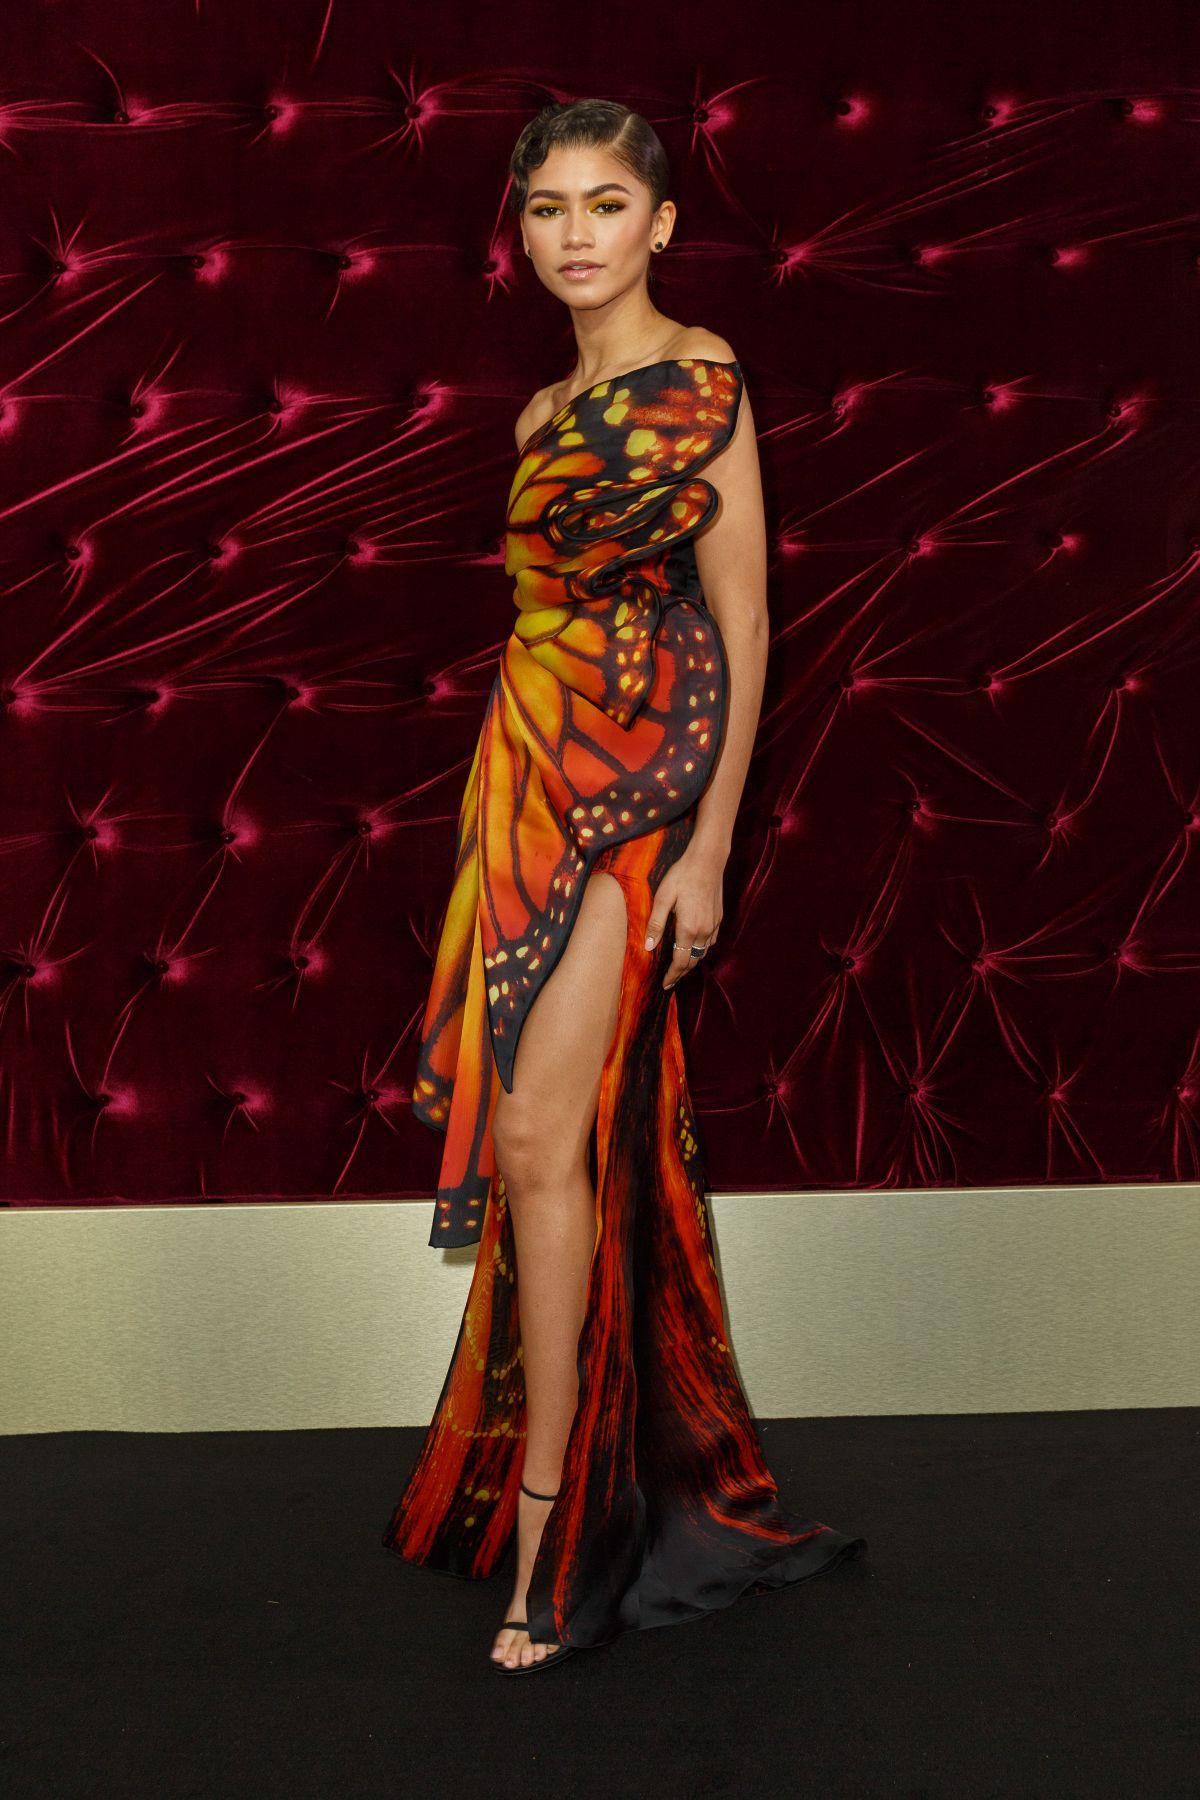 Zendaya Coleman At The Greatest Showman Premiere In Sydney